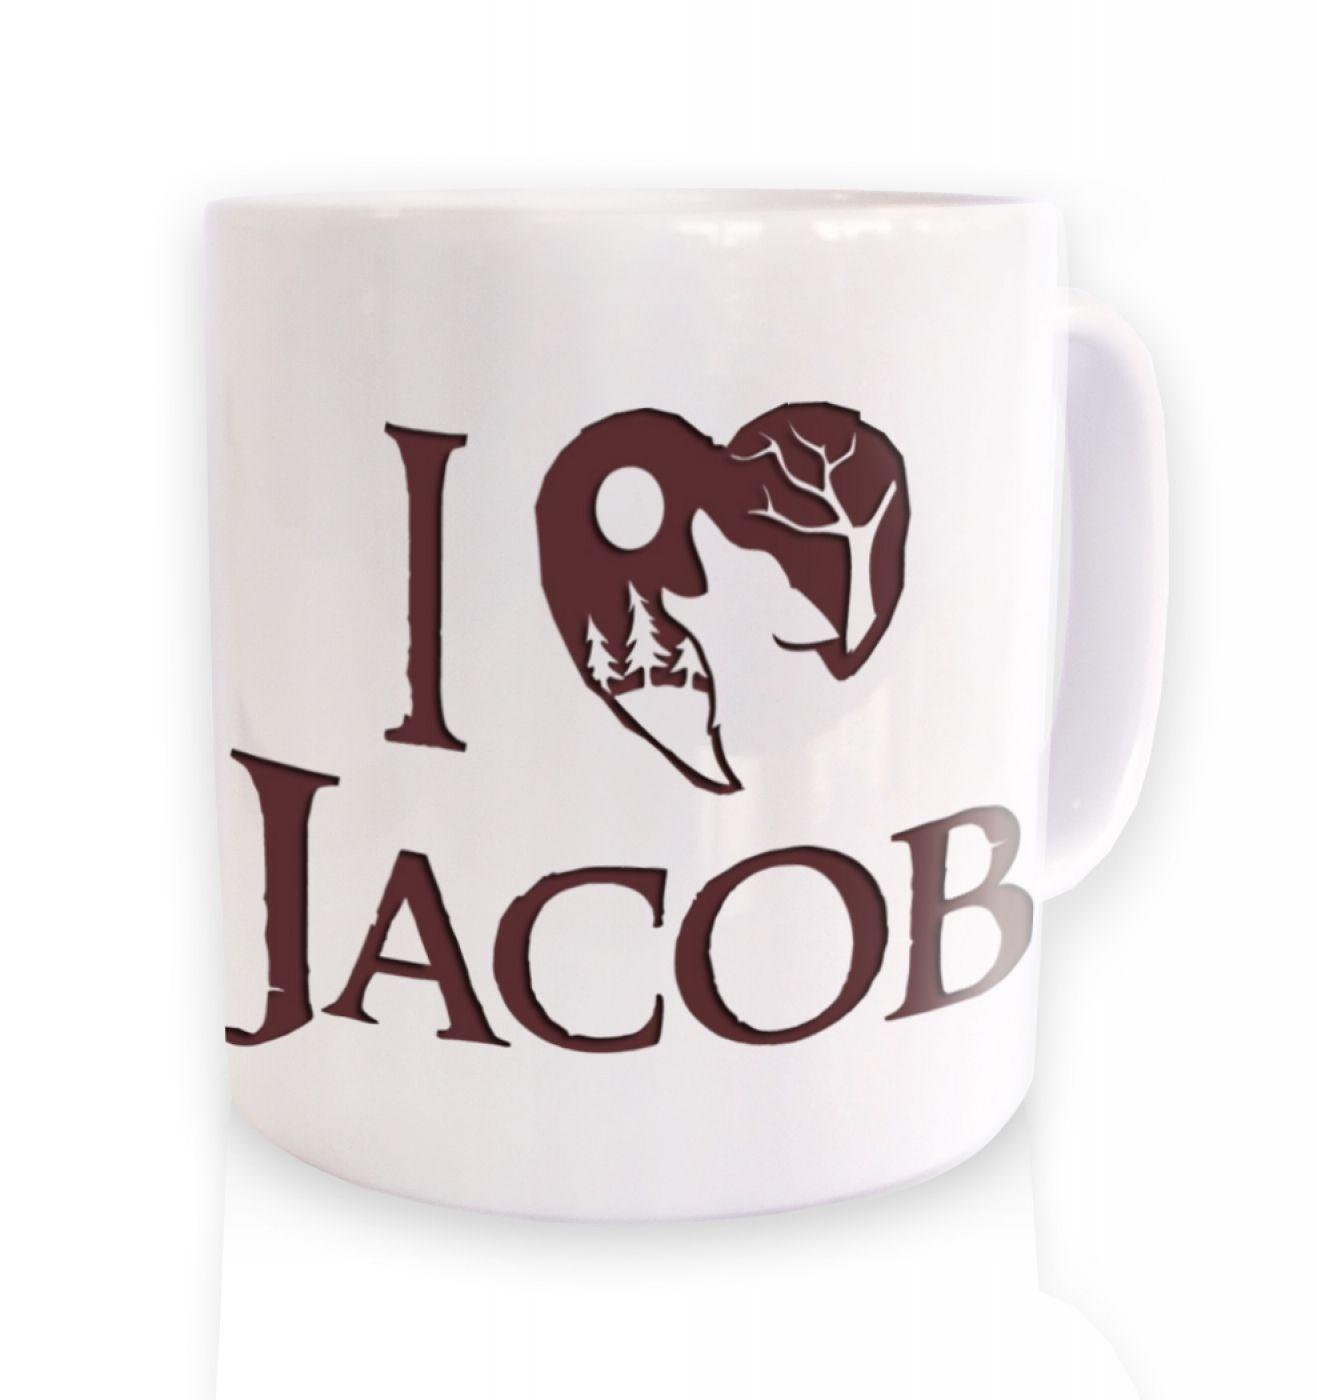 I Heart Jacob (brown) ceramic coffee mug